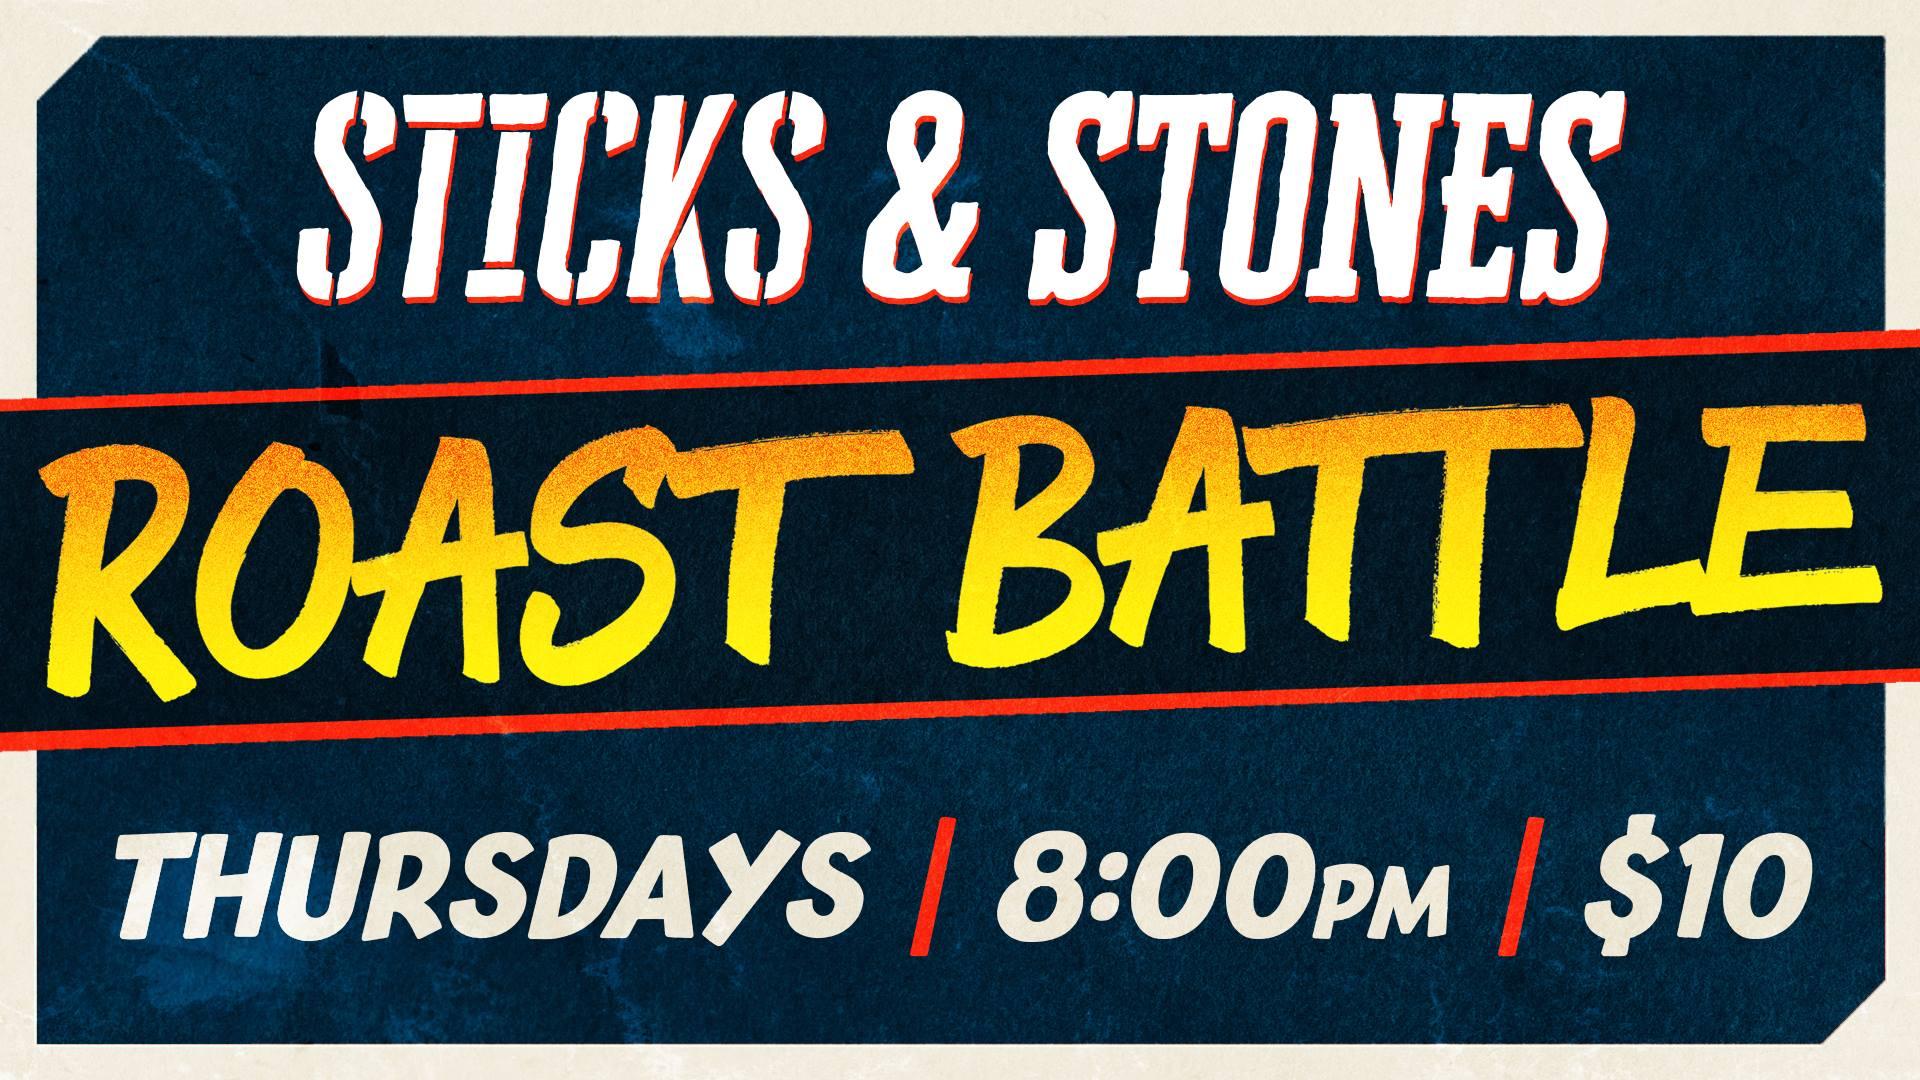 Sticks & Stones – A Roast Battle Comedy Show